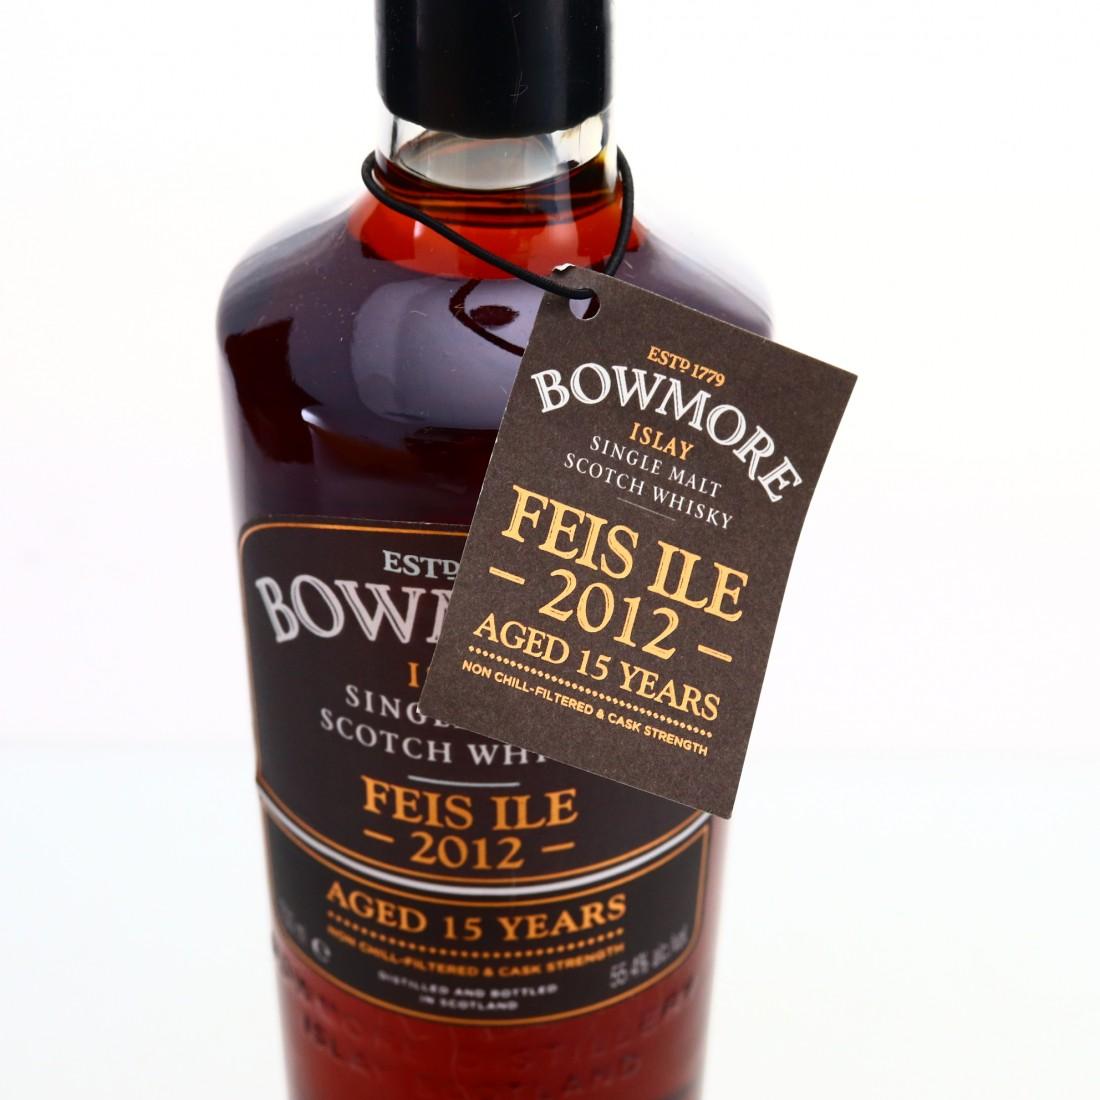 Bowmore 15 Year Old Feis Ile 2012